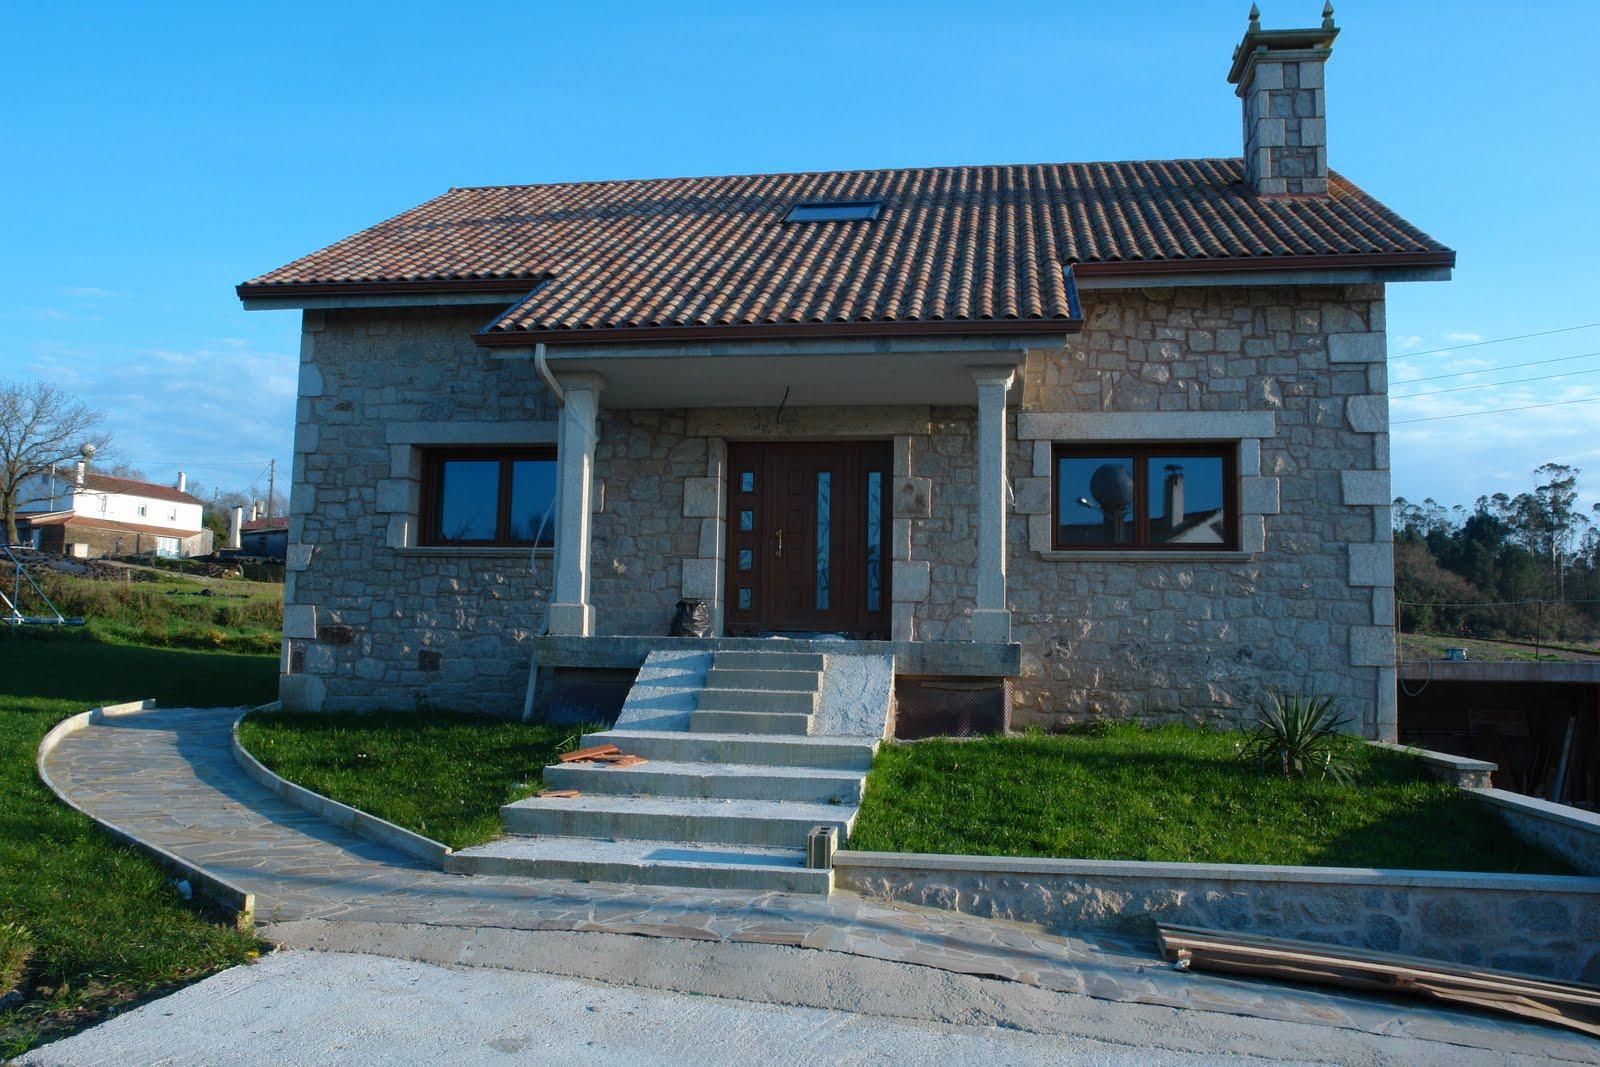 Arquitectura t cnica mir s vivienda unifamiliar en piedra for Arquitectura tecnica ua